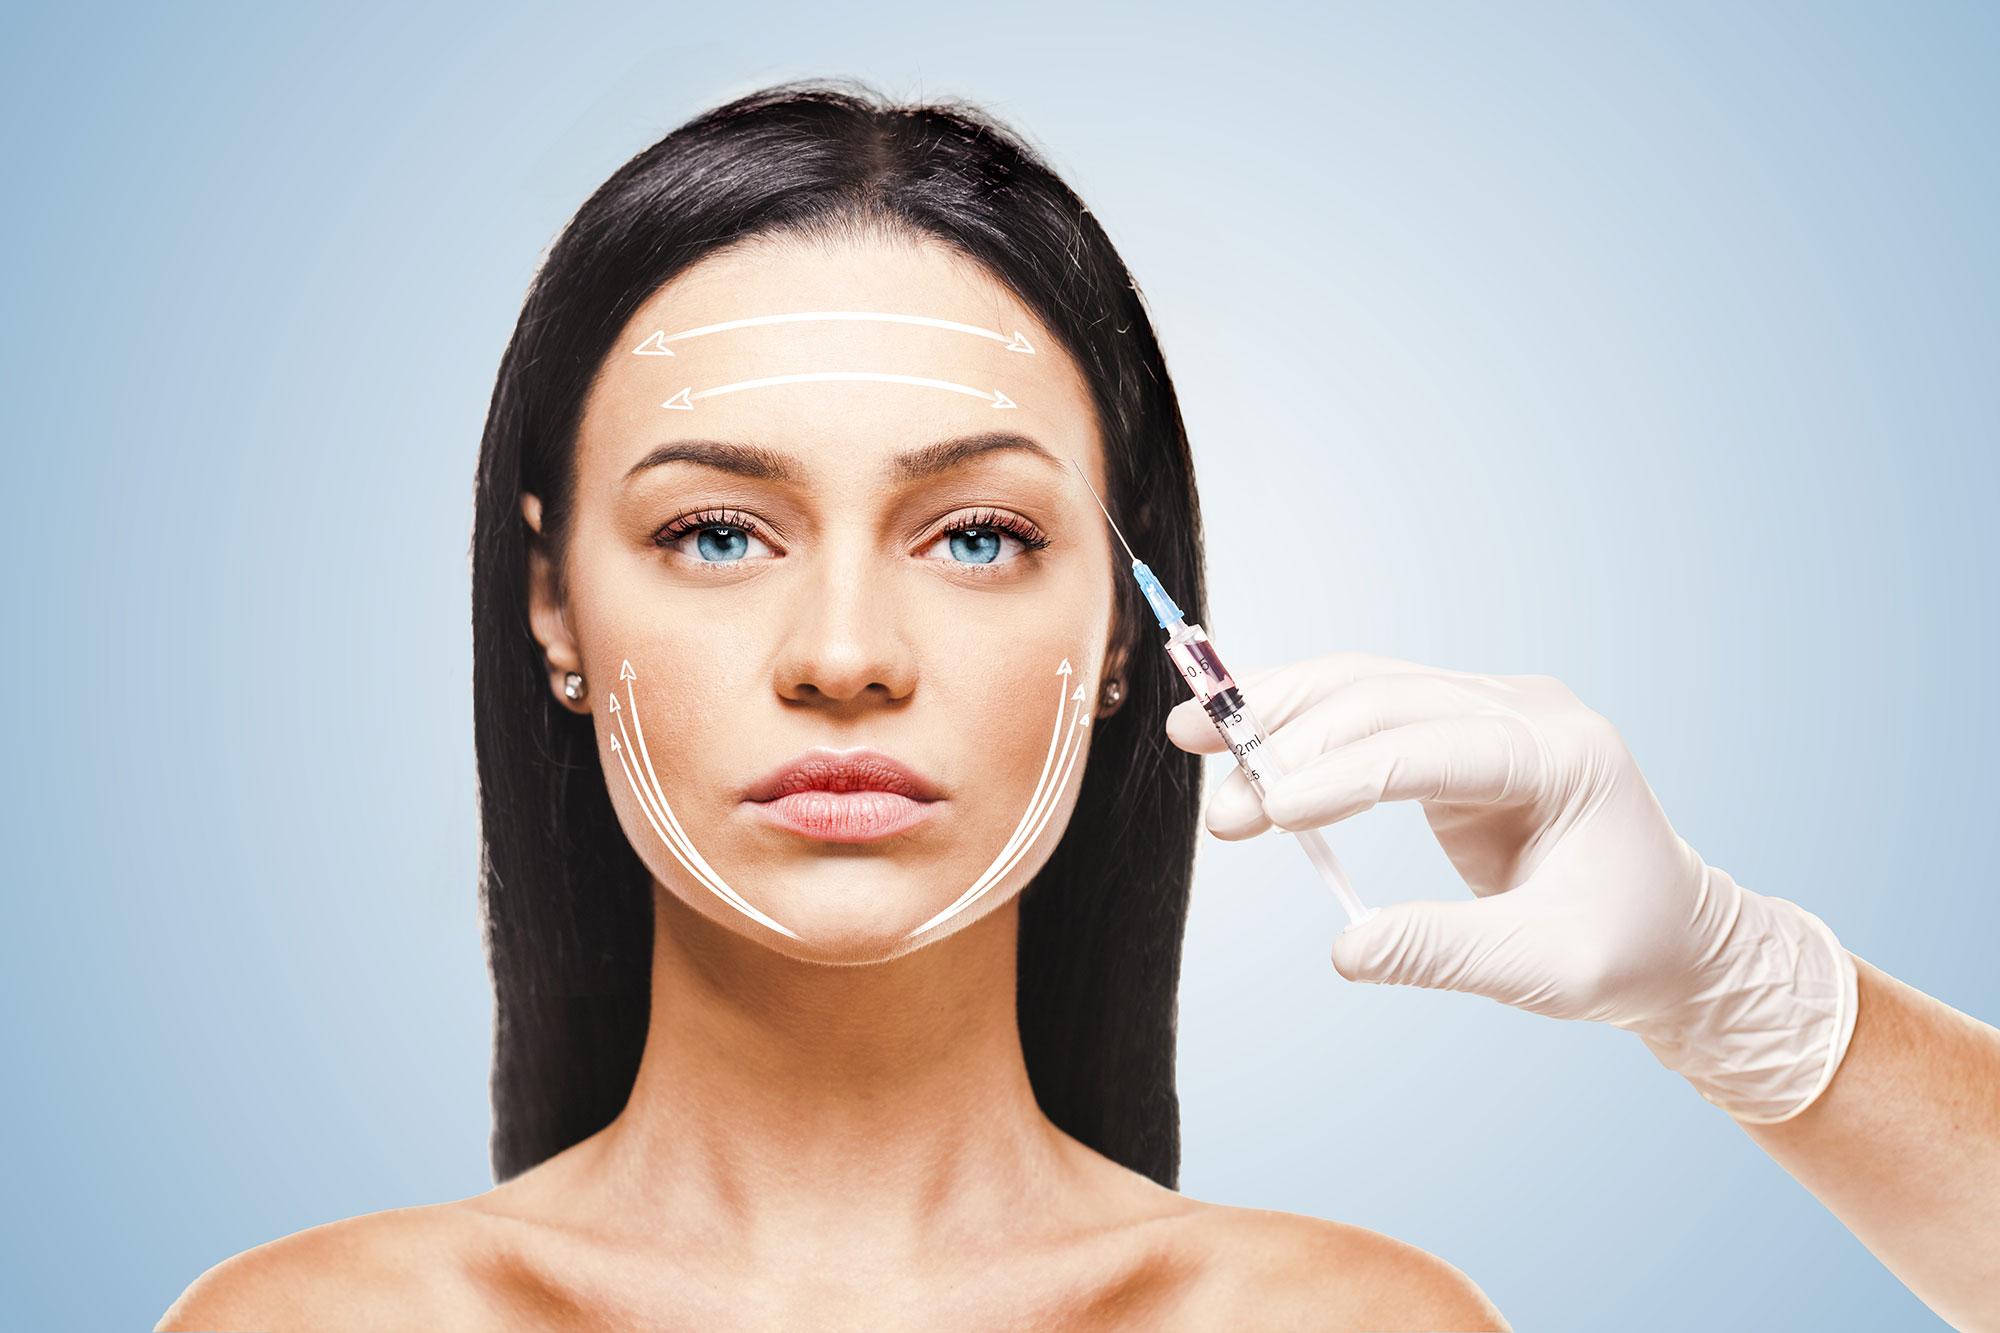 CosMedic Laser and Skin Care Botox